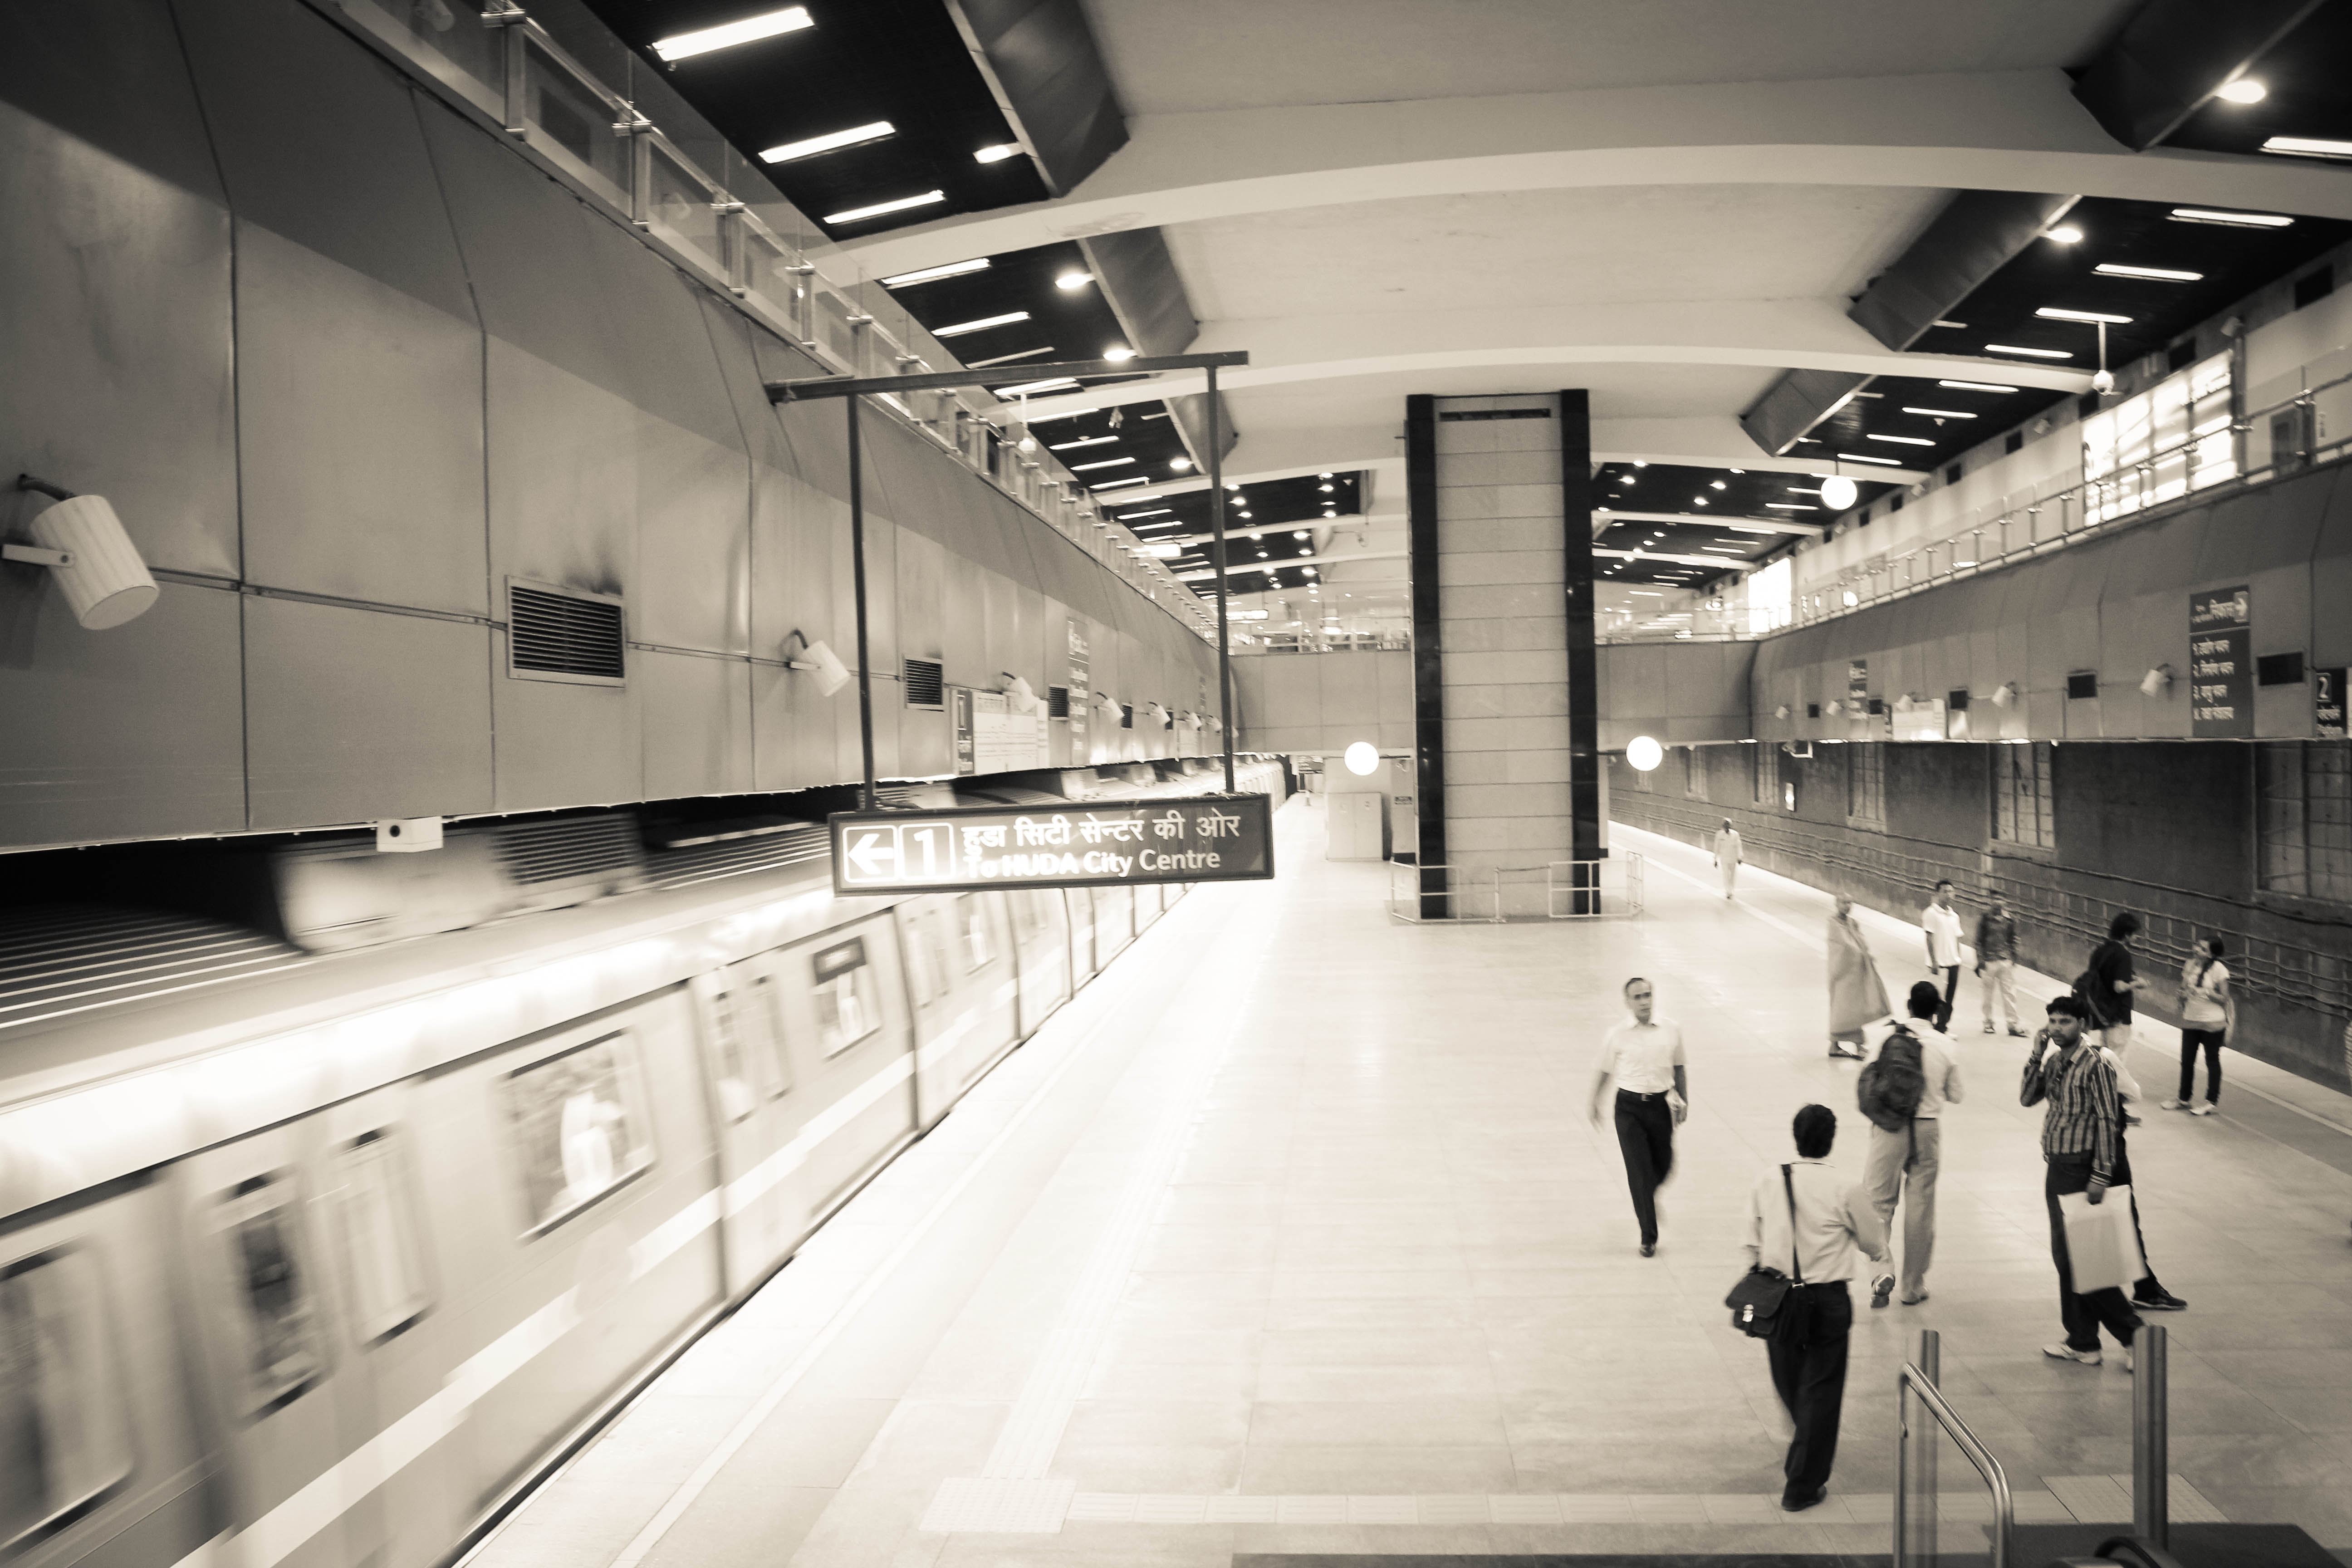 Delhi metro wikipedia delhi underground metro stationg voltagebd Choice Image